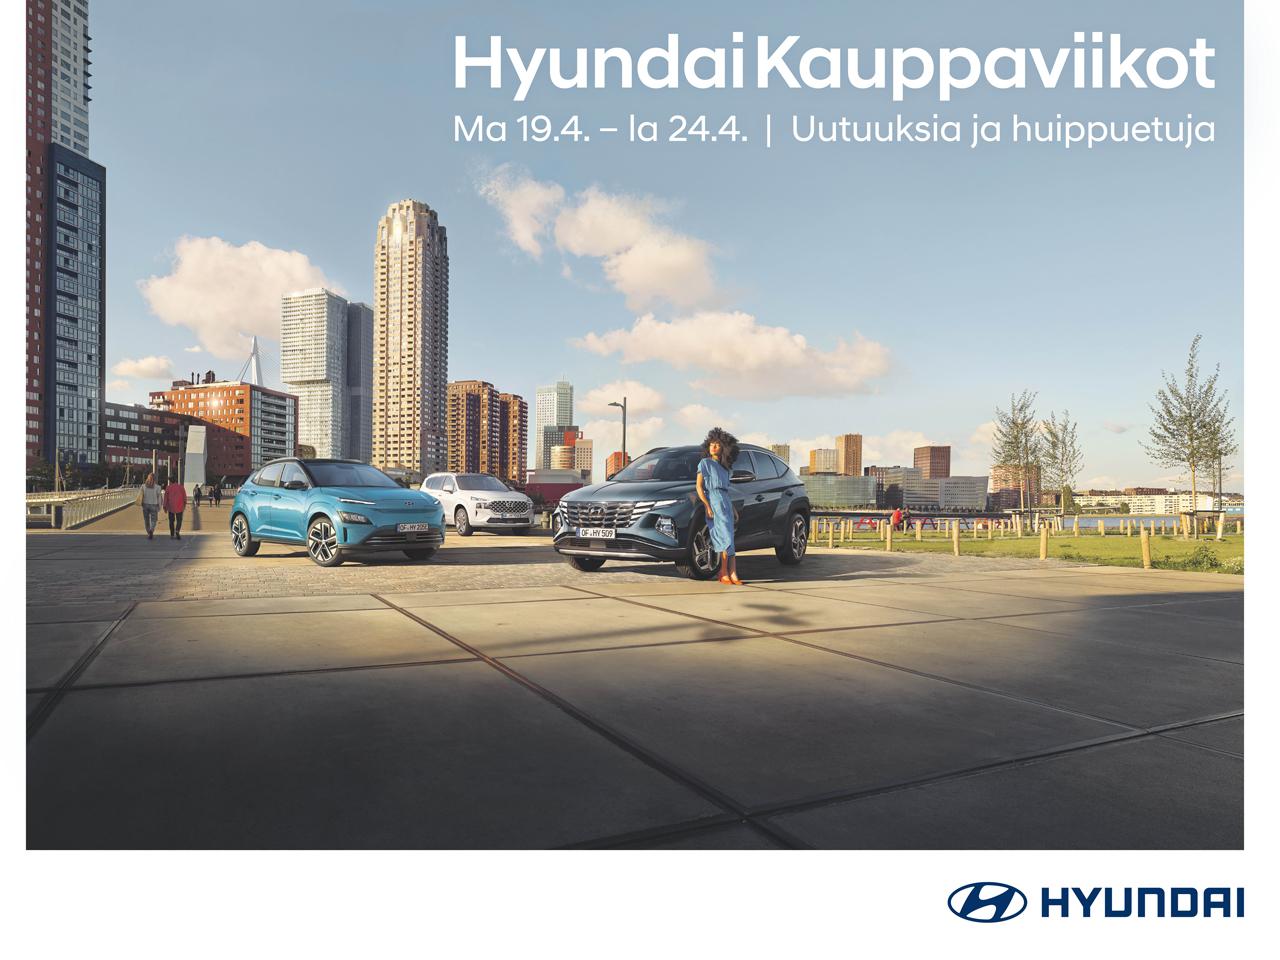 Hyundai Kauppaviikot